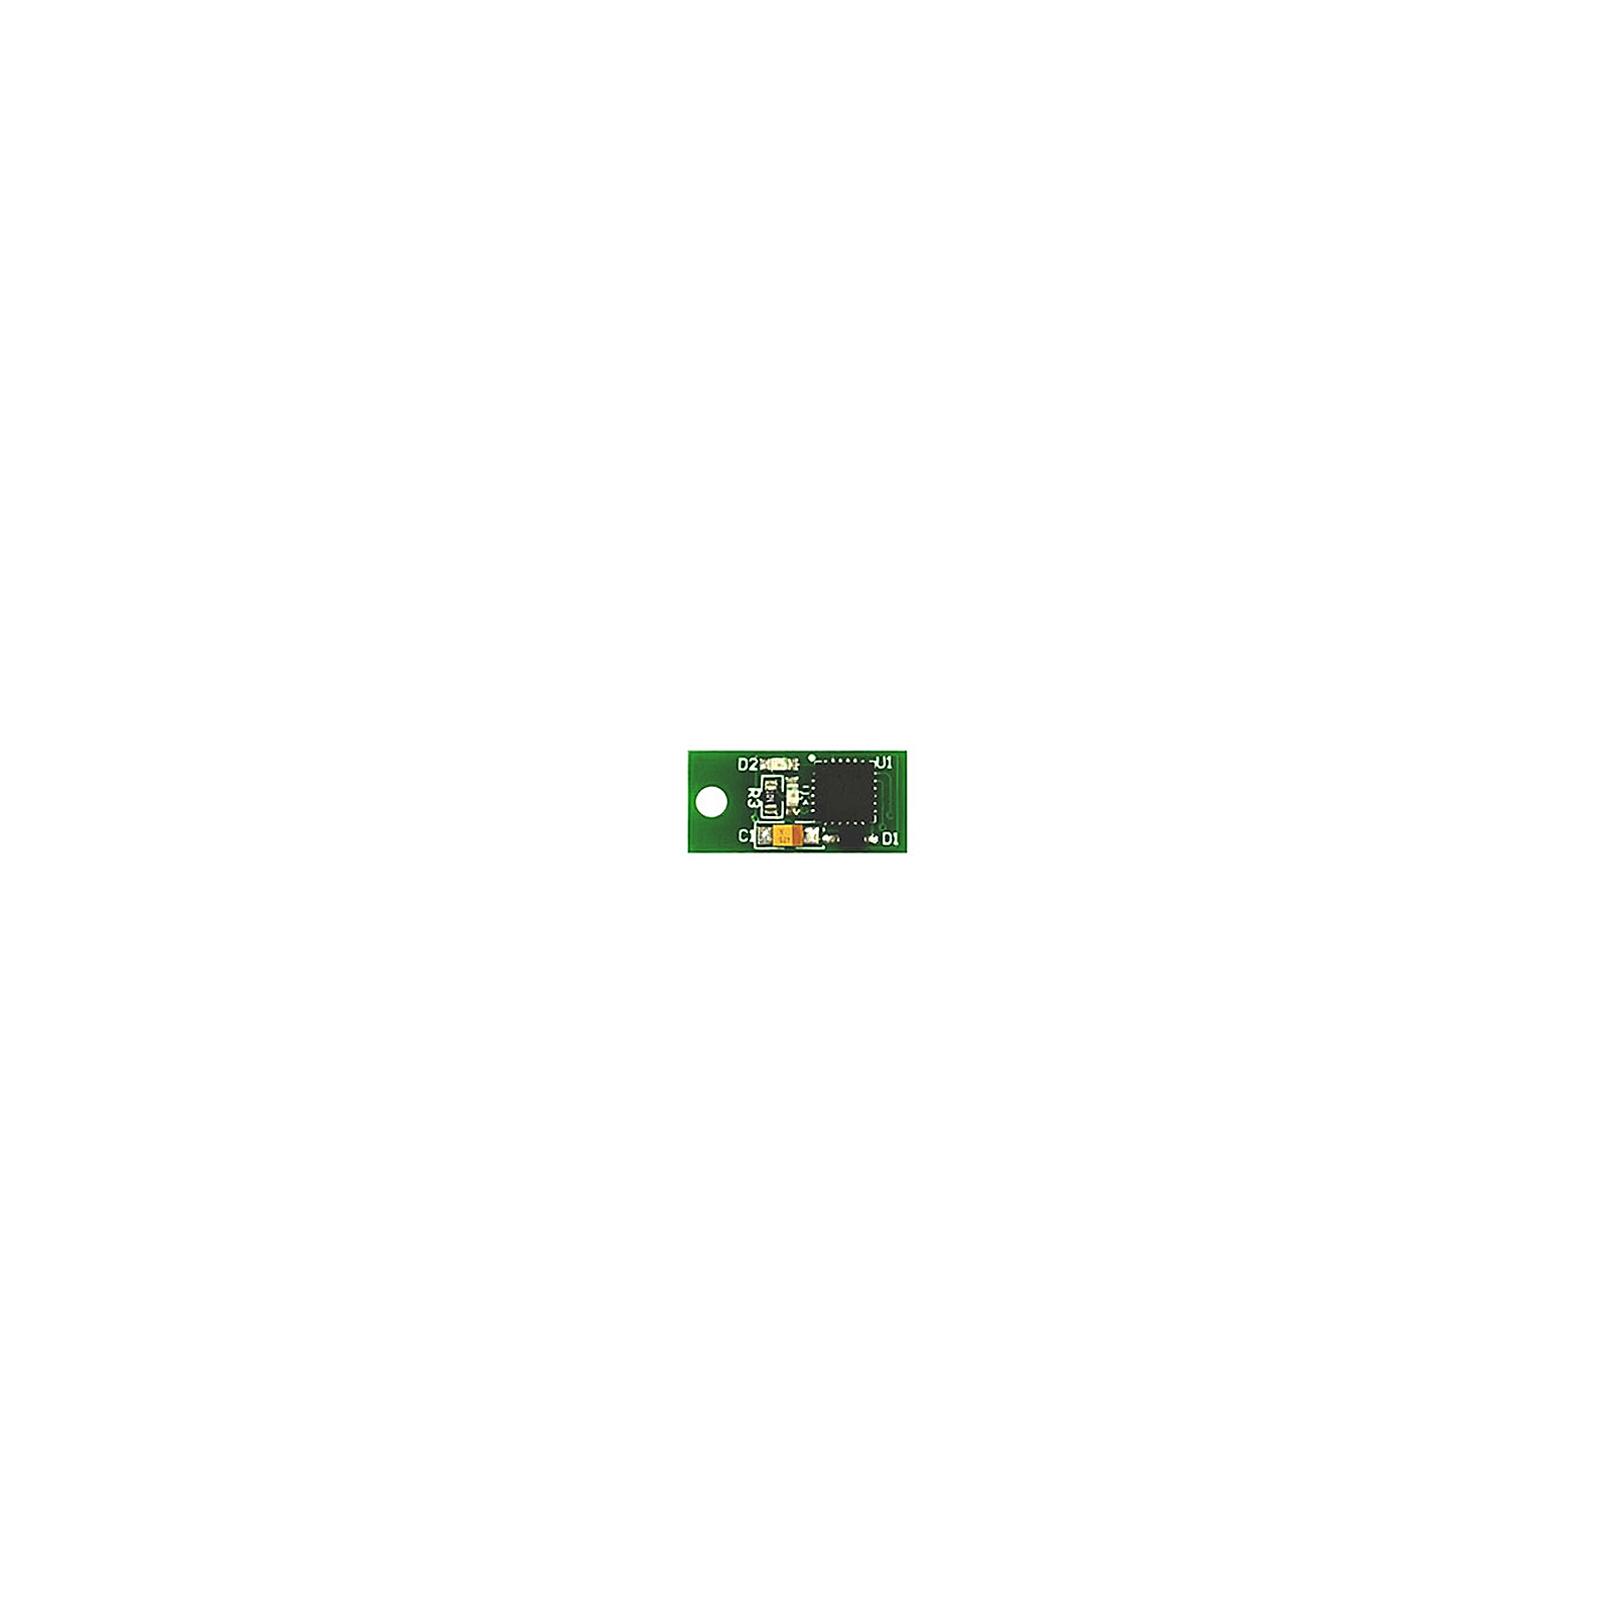 Чип для картриджа CanonC250 (8519B002) 21.5k yellow Static Control (C250CP-YEU)